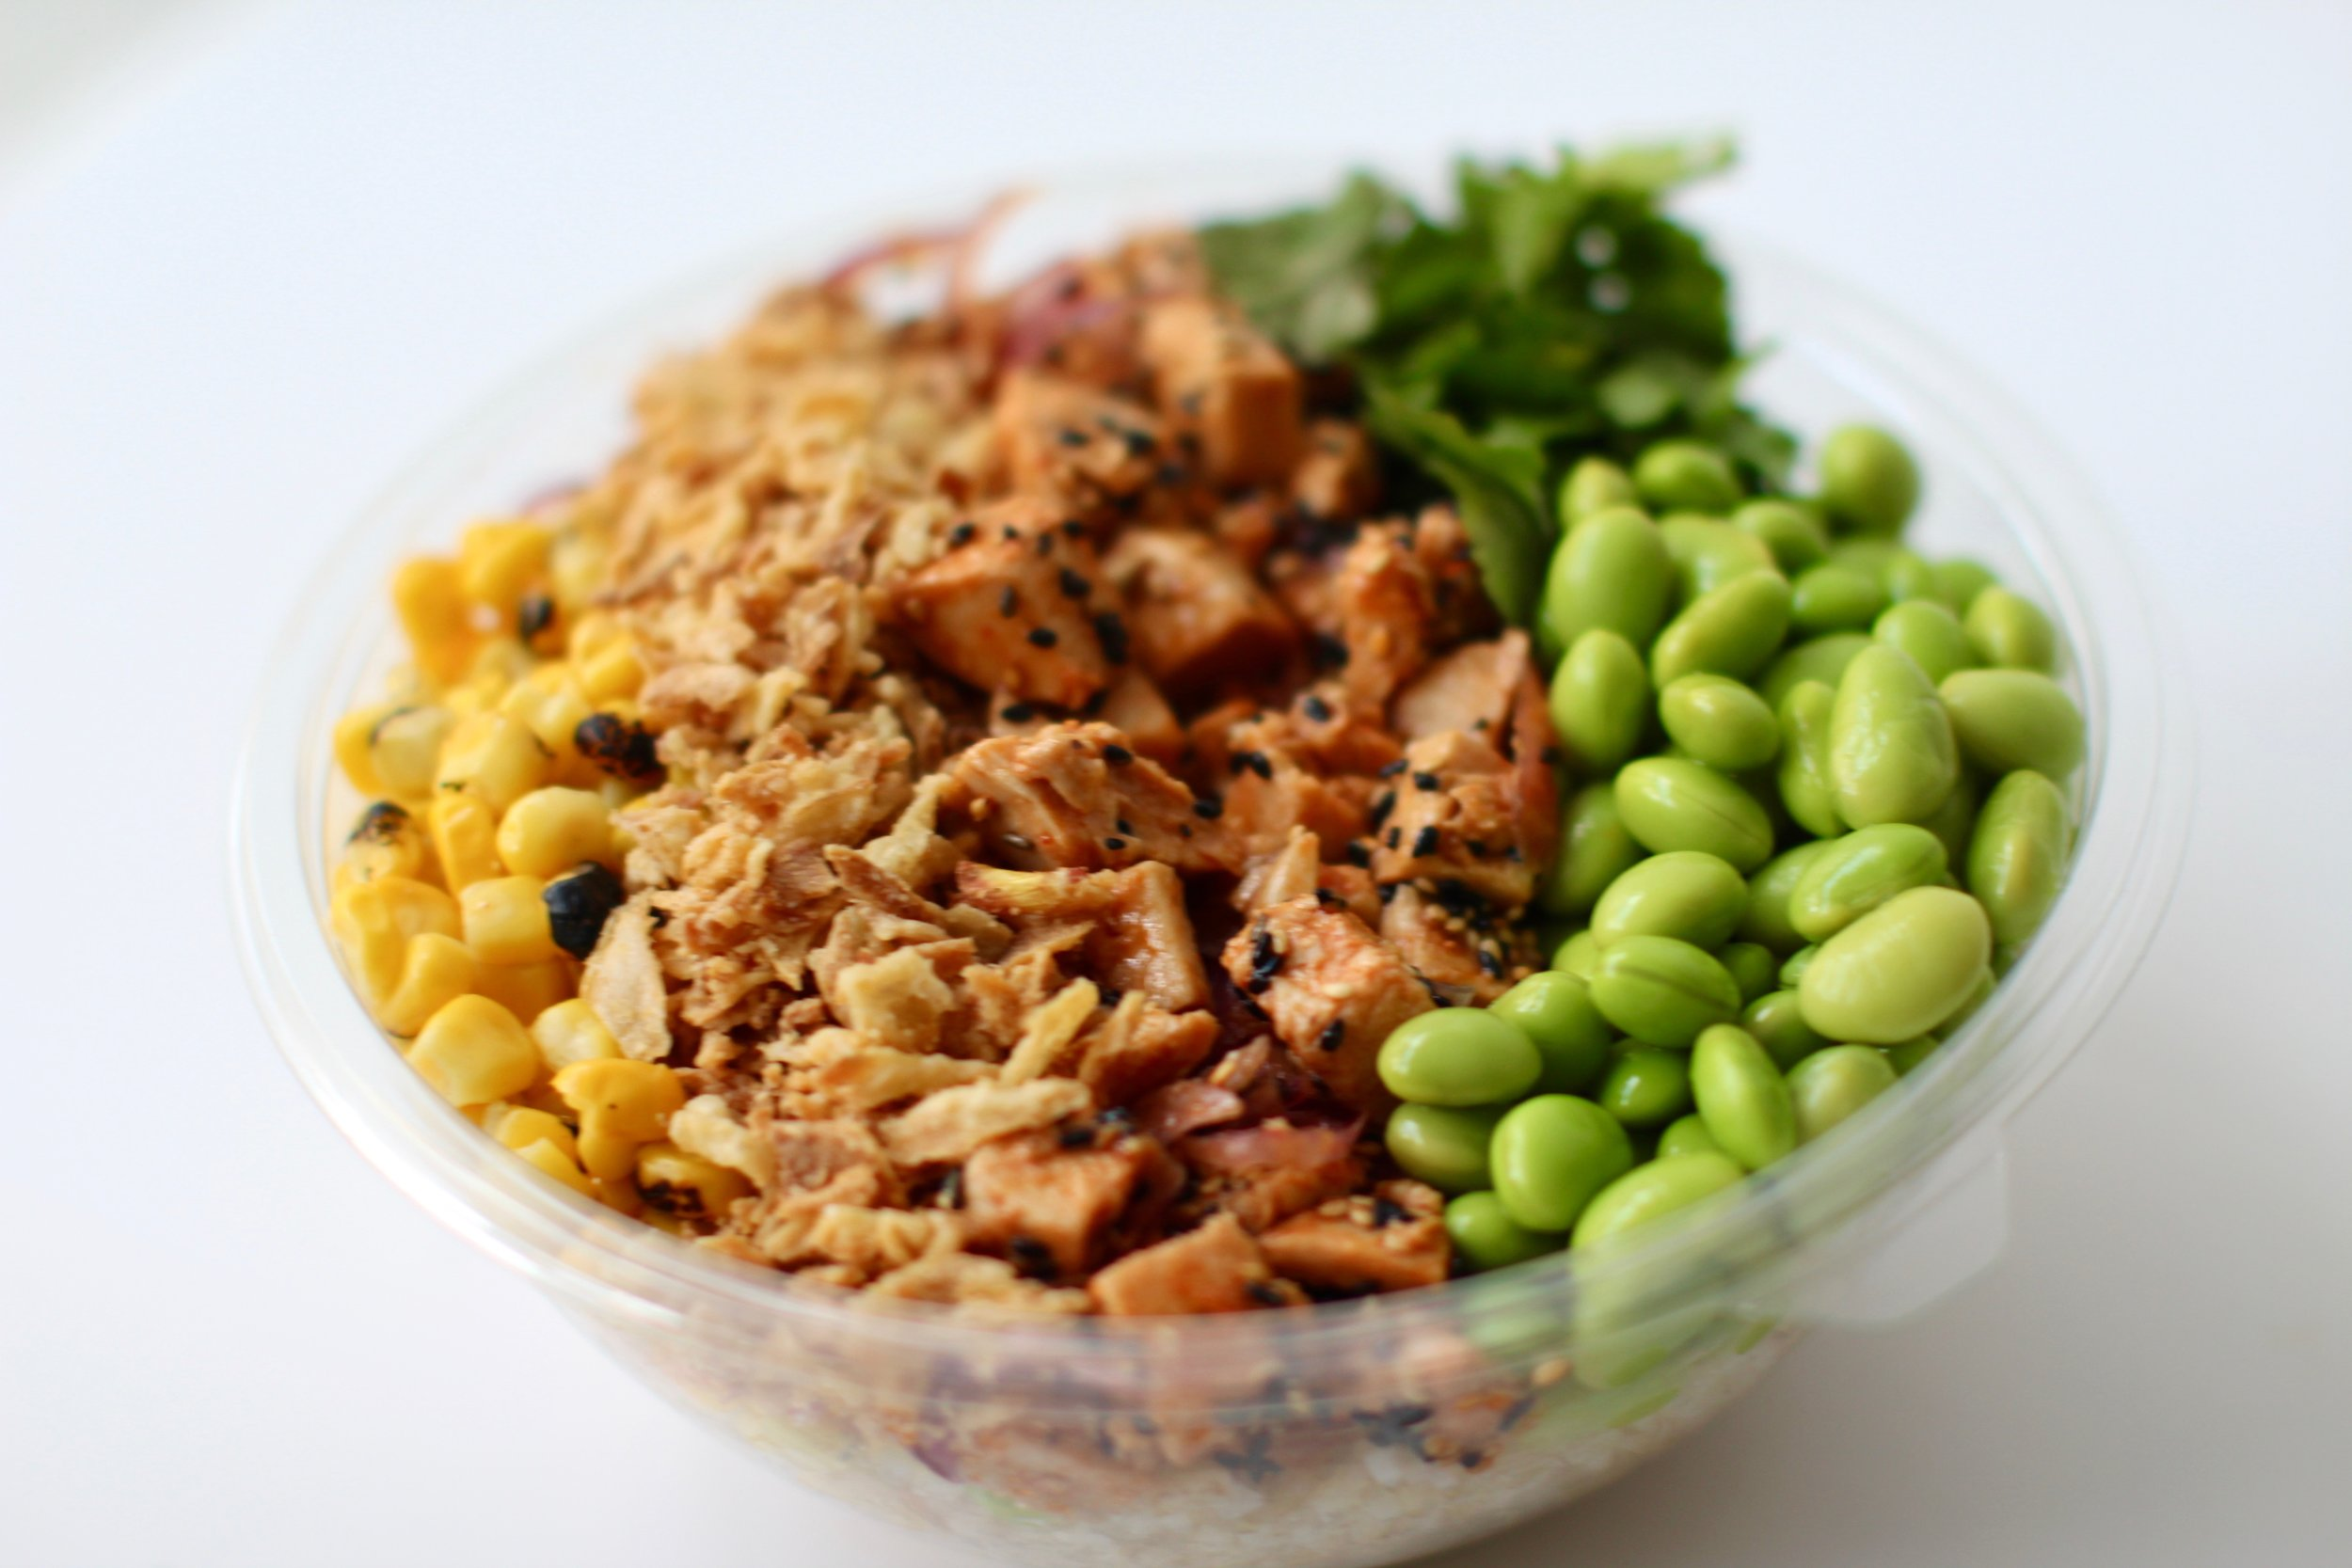 Side Chick - Rice, Spicy Chicken, Red Onion, Burnt Corn, Edamame, Fried Onion, CorianderKorean BBQ (GF,DF)